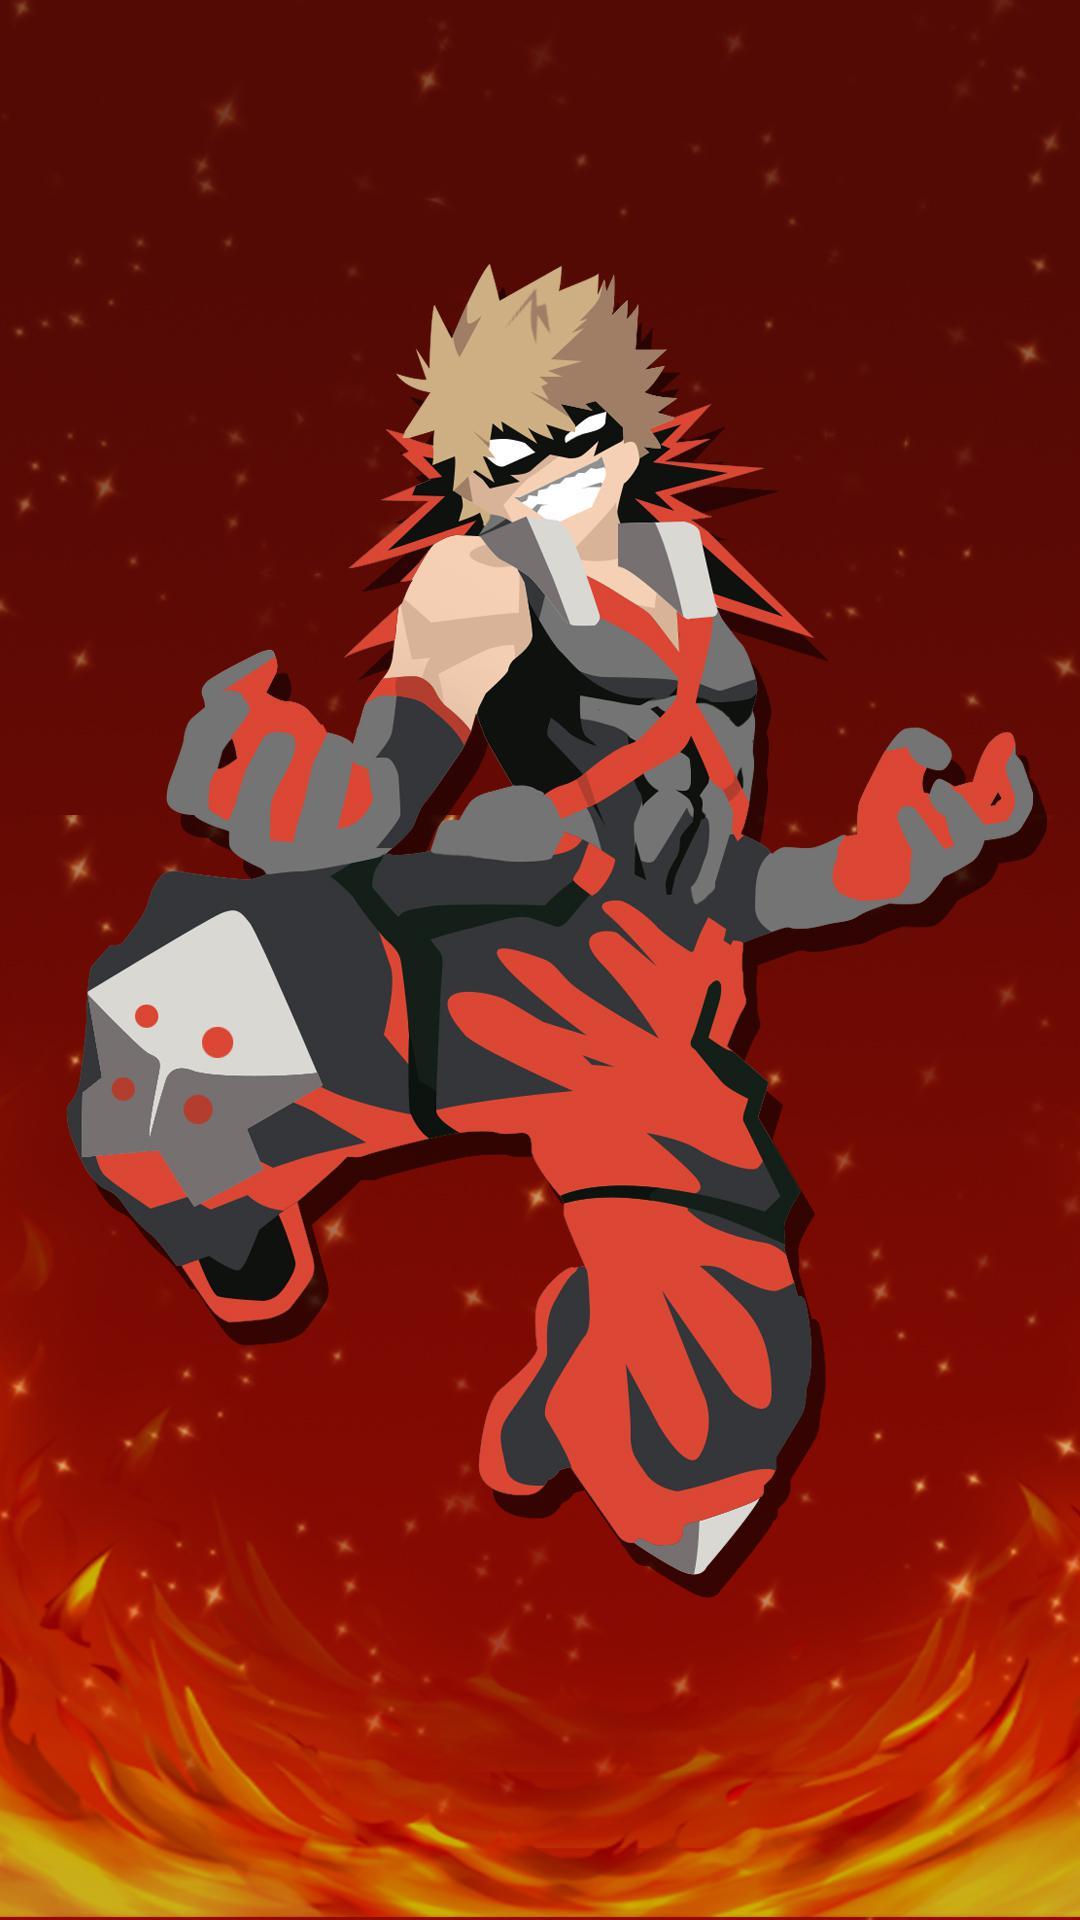 My Hero Academia Bakugo Wallpapers Top Free My Hero Academia